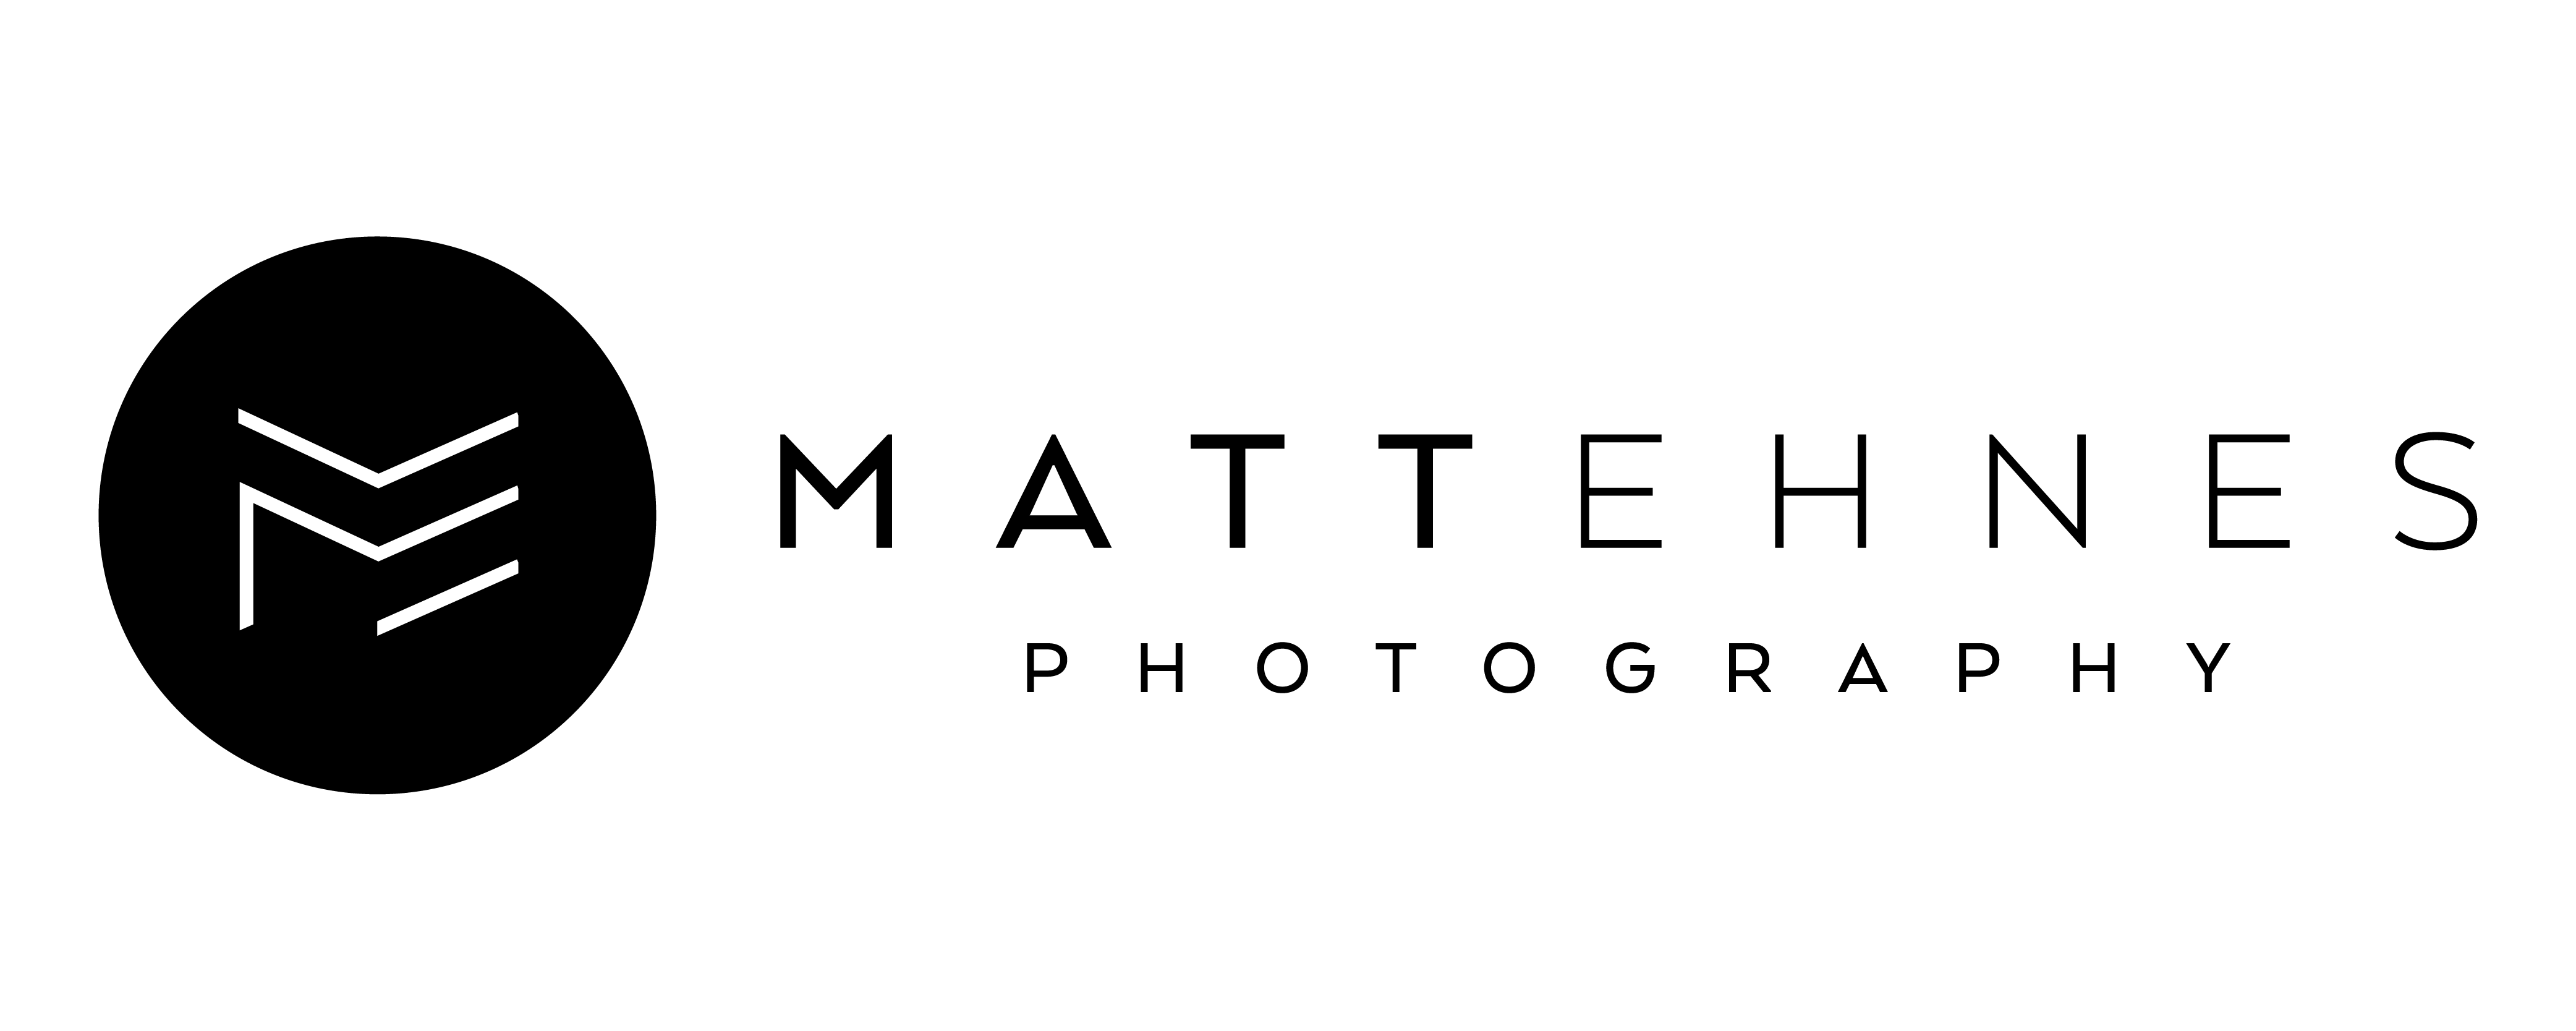 Matt Ehnes Photography